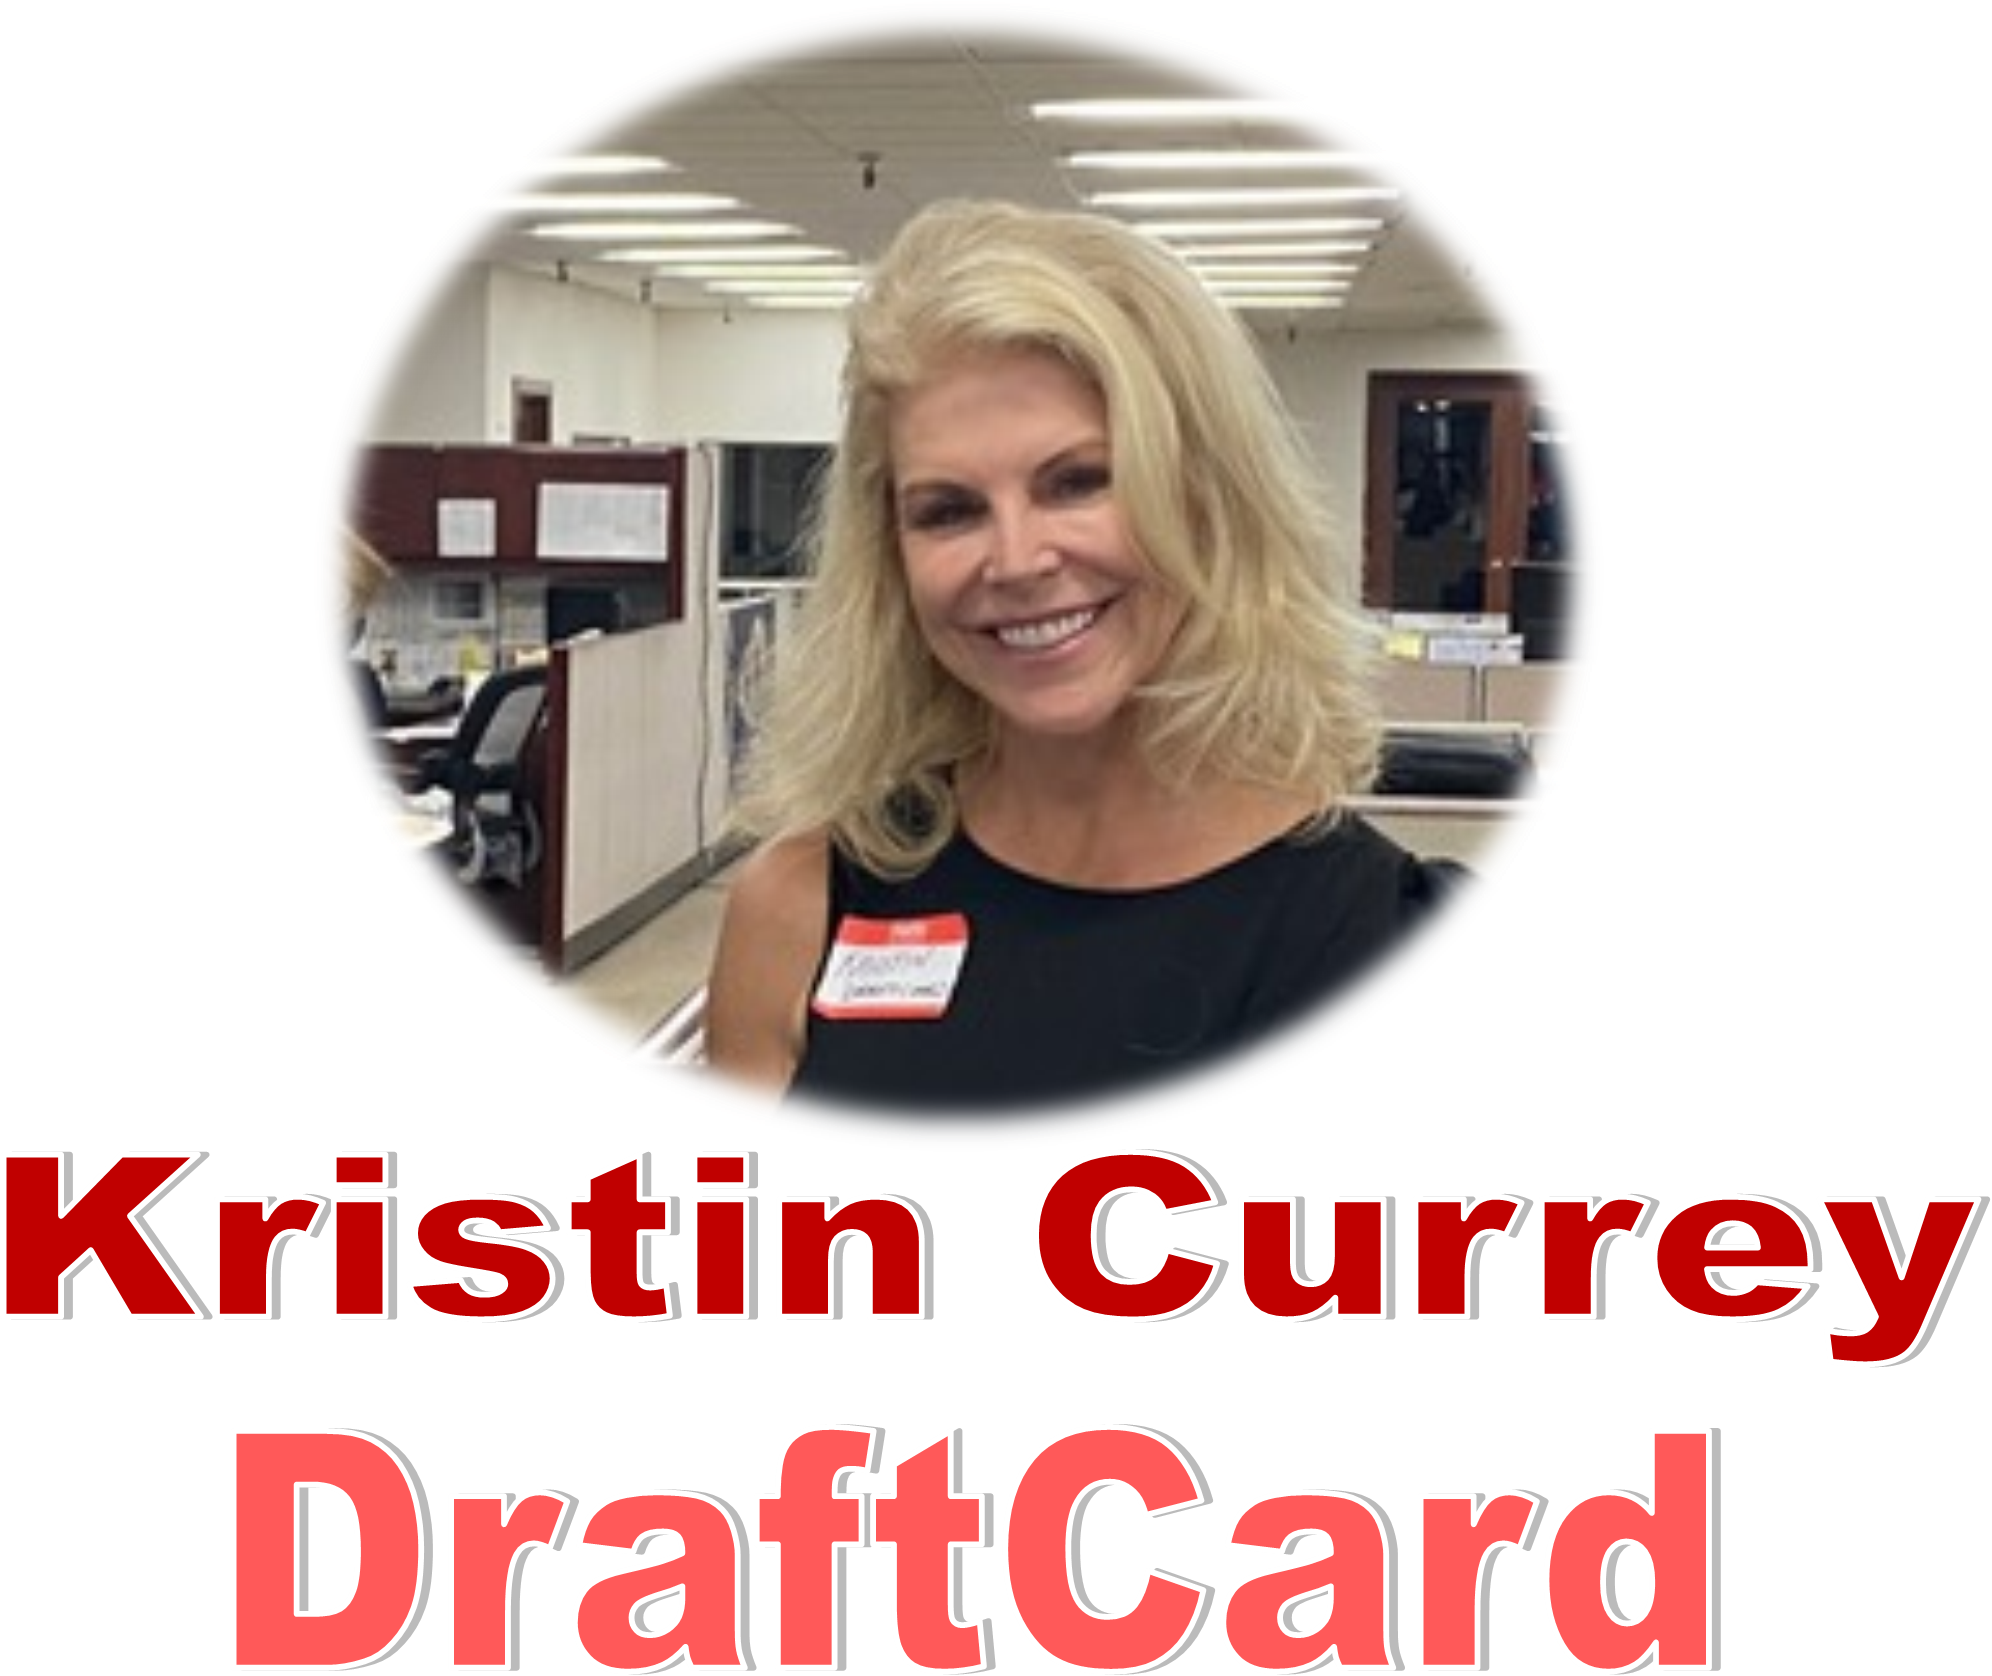 Kristin Currey